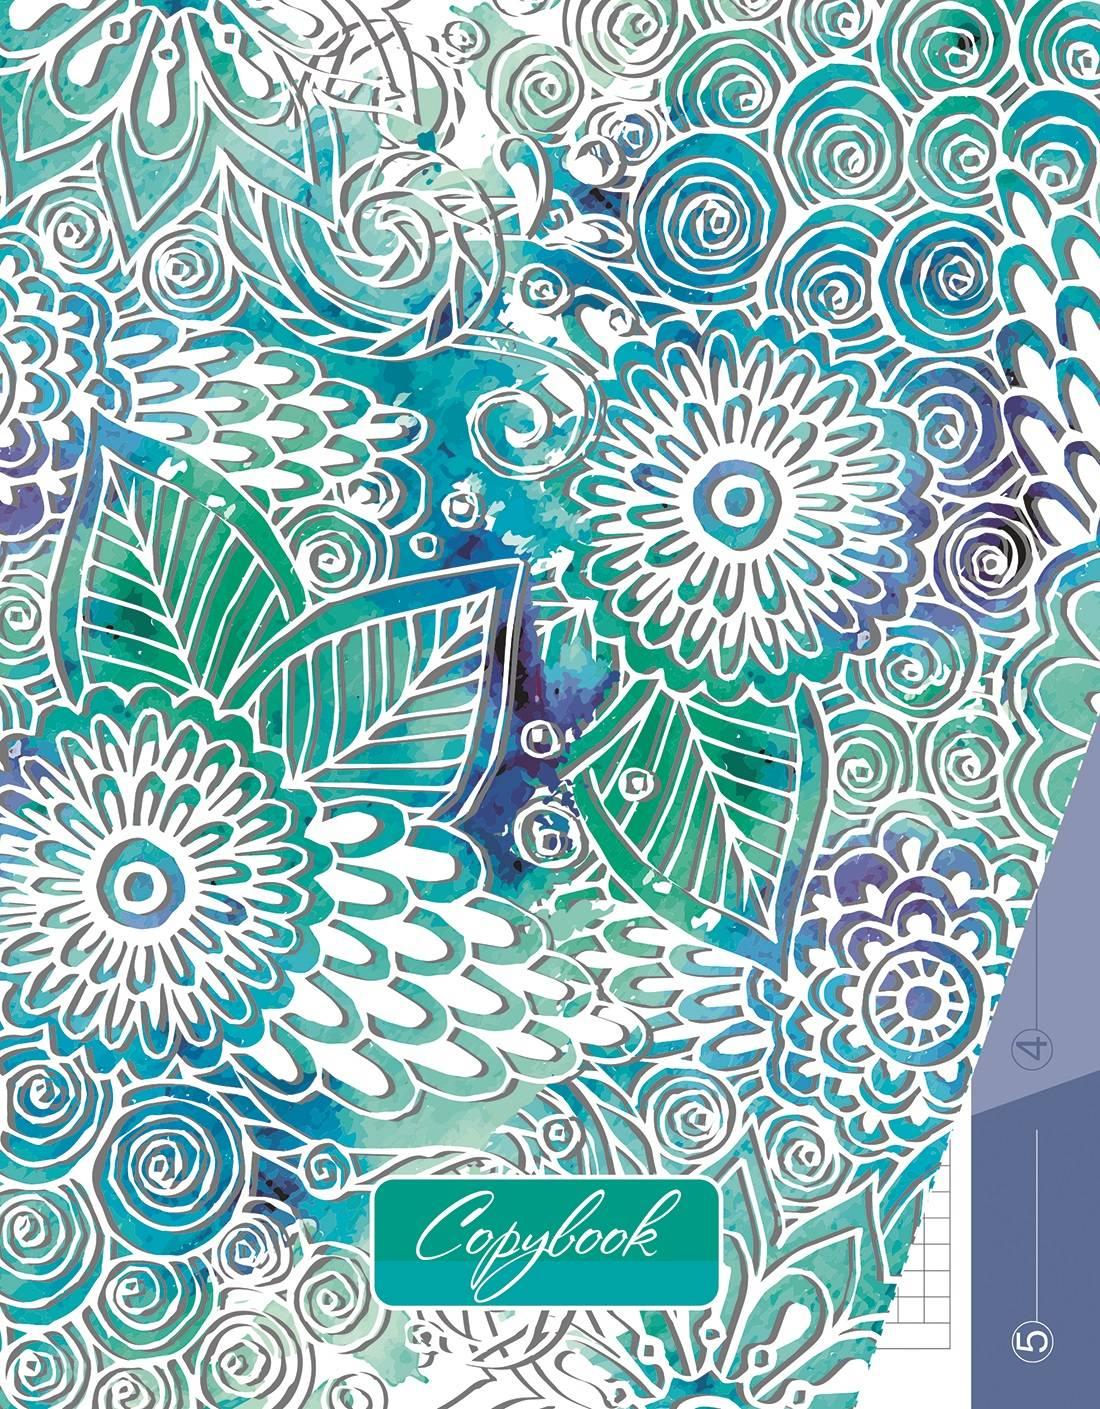 КТС-Про Бизнес-блокнот А5 215х165мм 80л кл. Цветочный узор 7БЦ тв. обл. гл. лам. 65г. м2